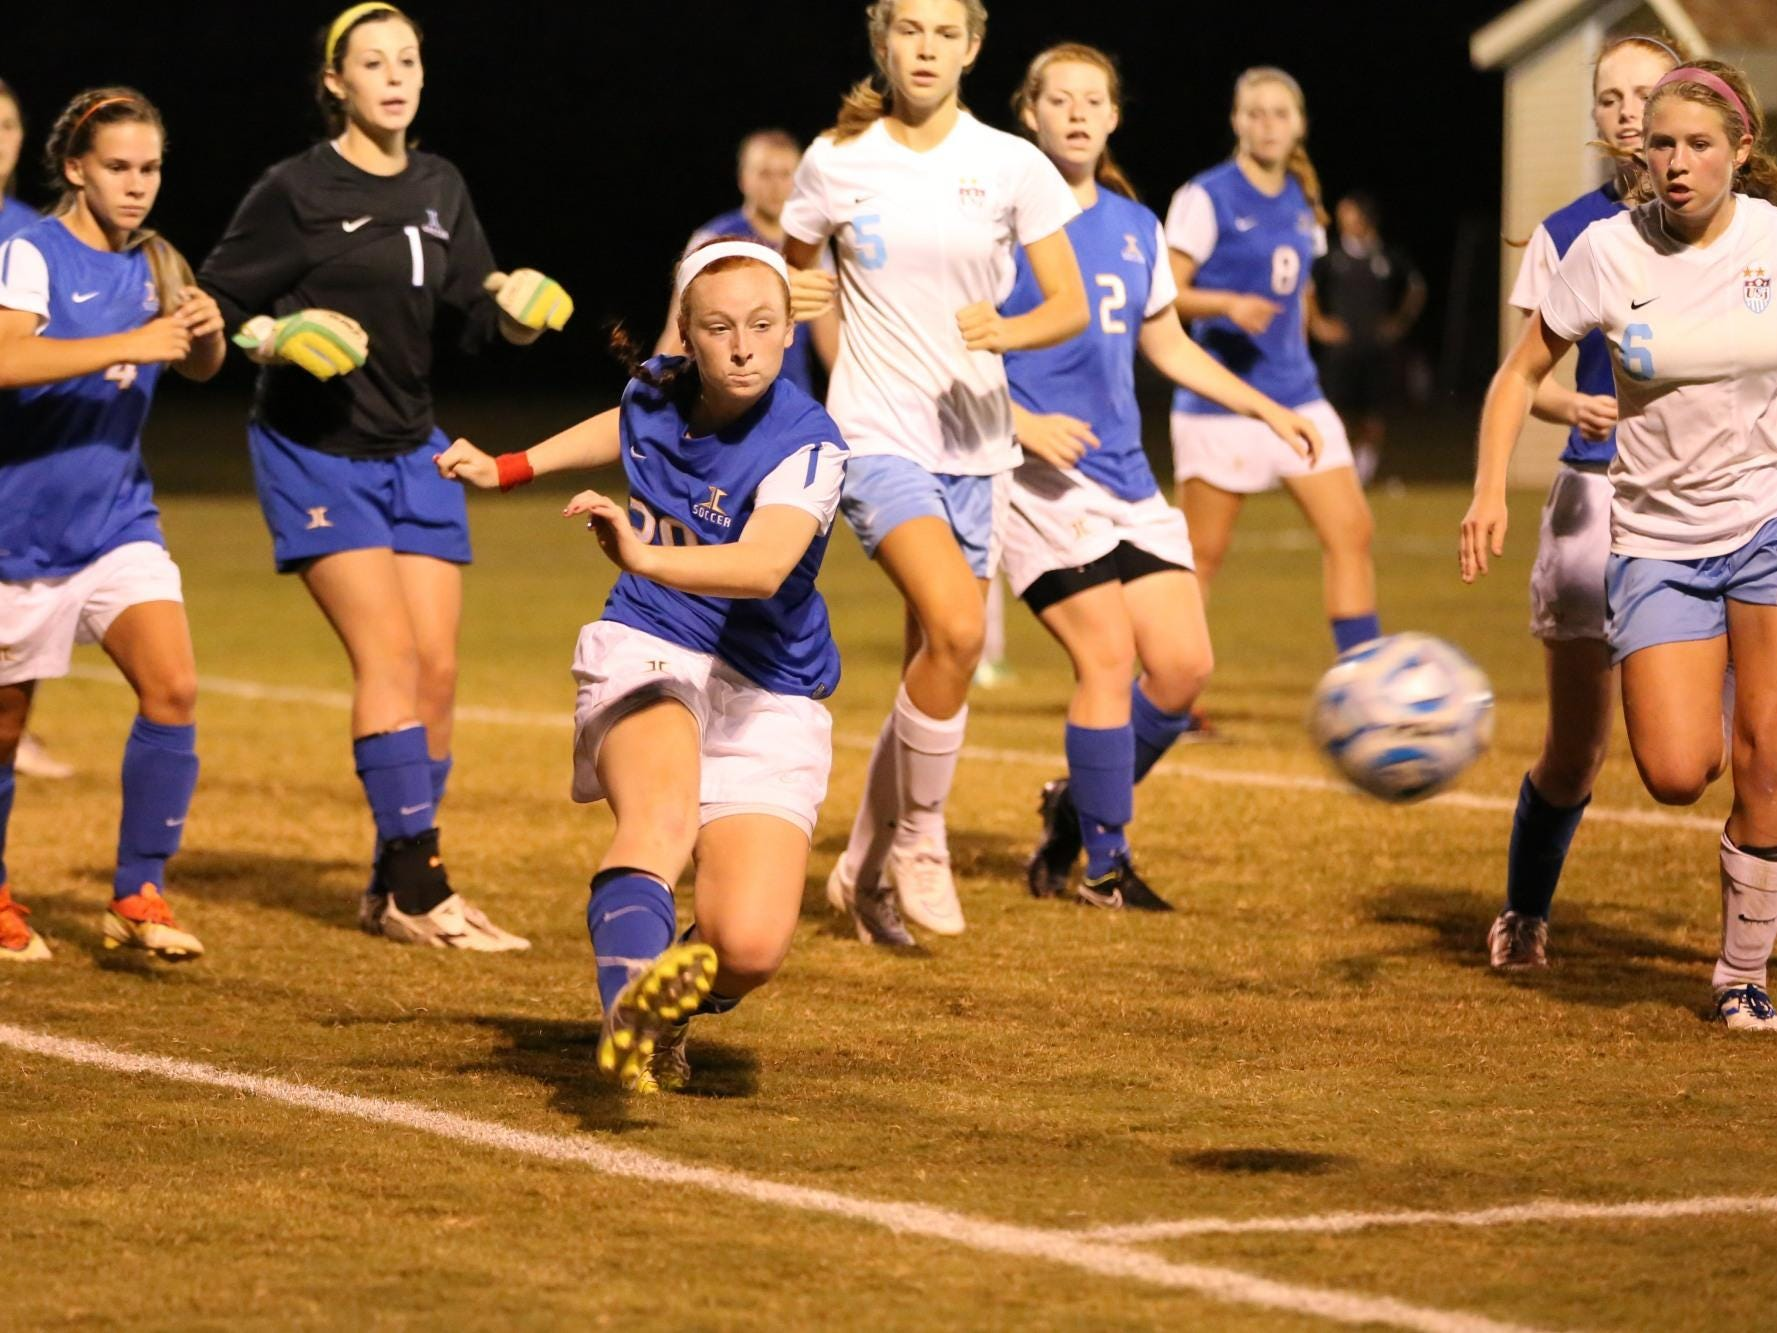 Jackson Christian's Catie Beth Hatch clears the ball against University School of Jackson last season.